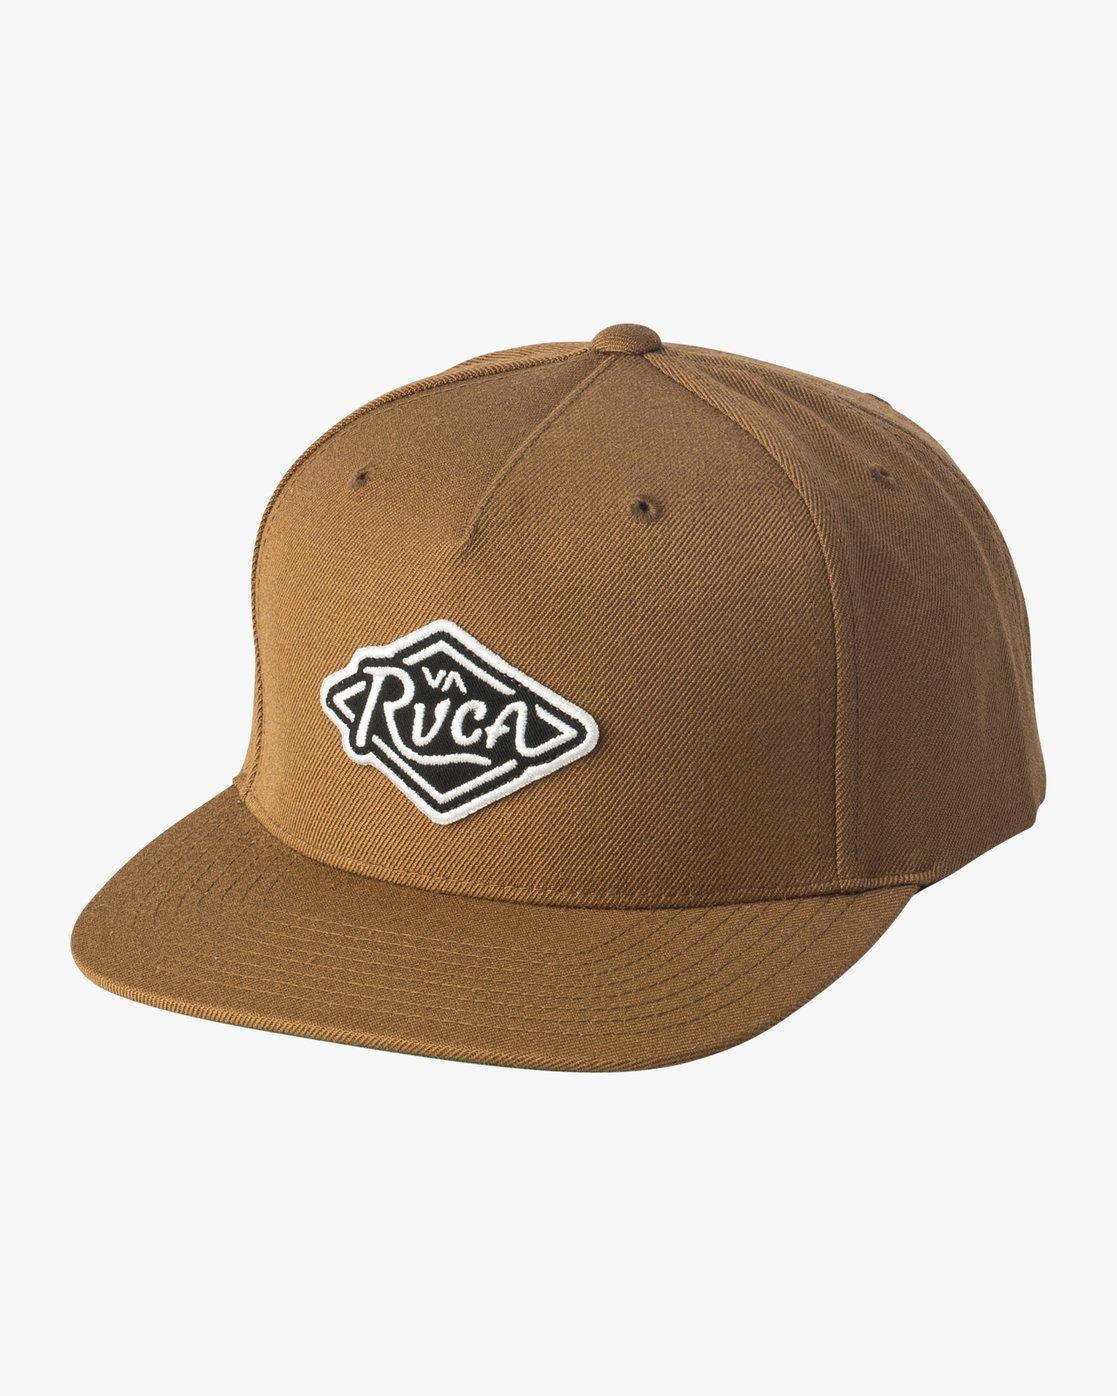 0 Script Snapback Hat Brown MAHWVRSP RVCA